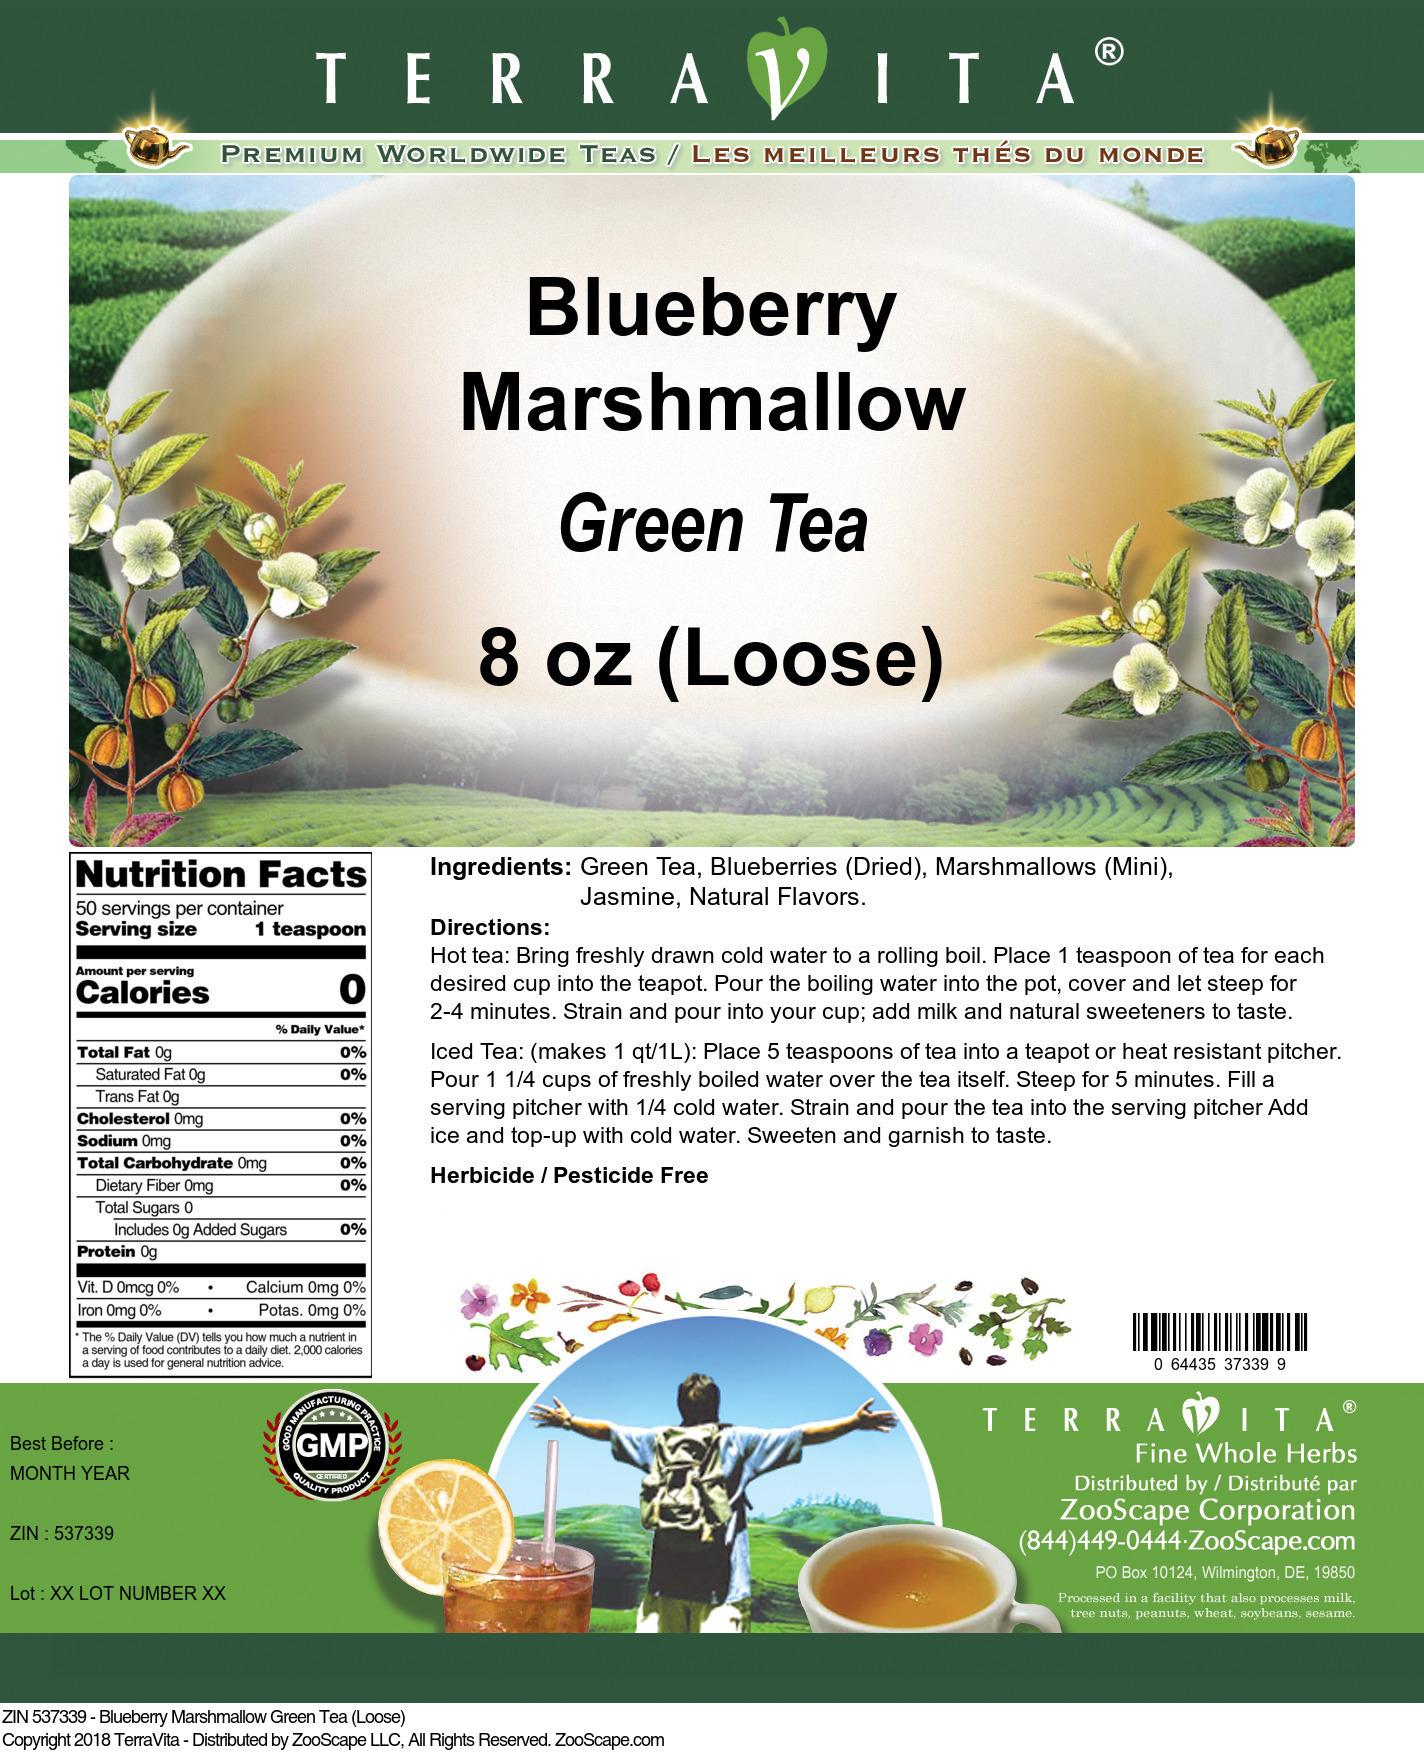 Blueberry Marshmallow Green Tea